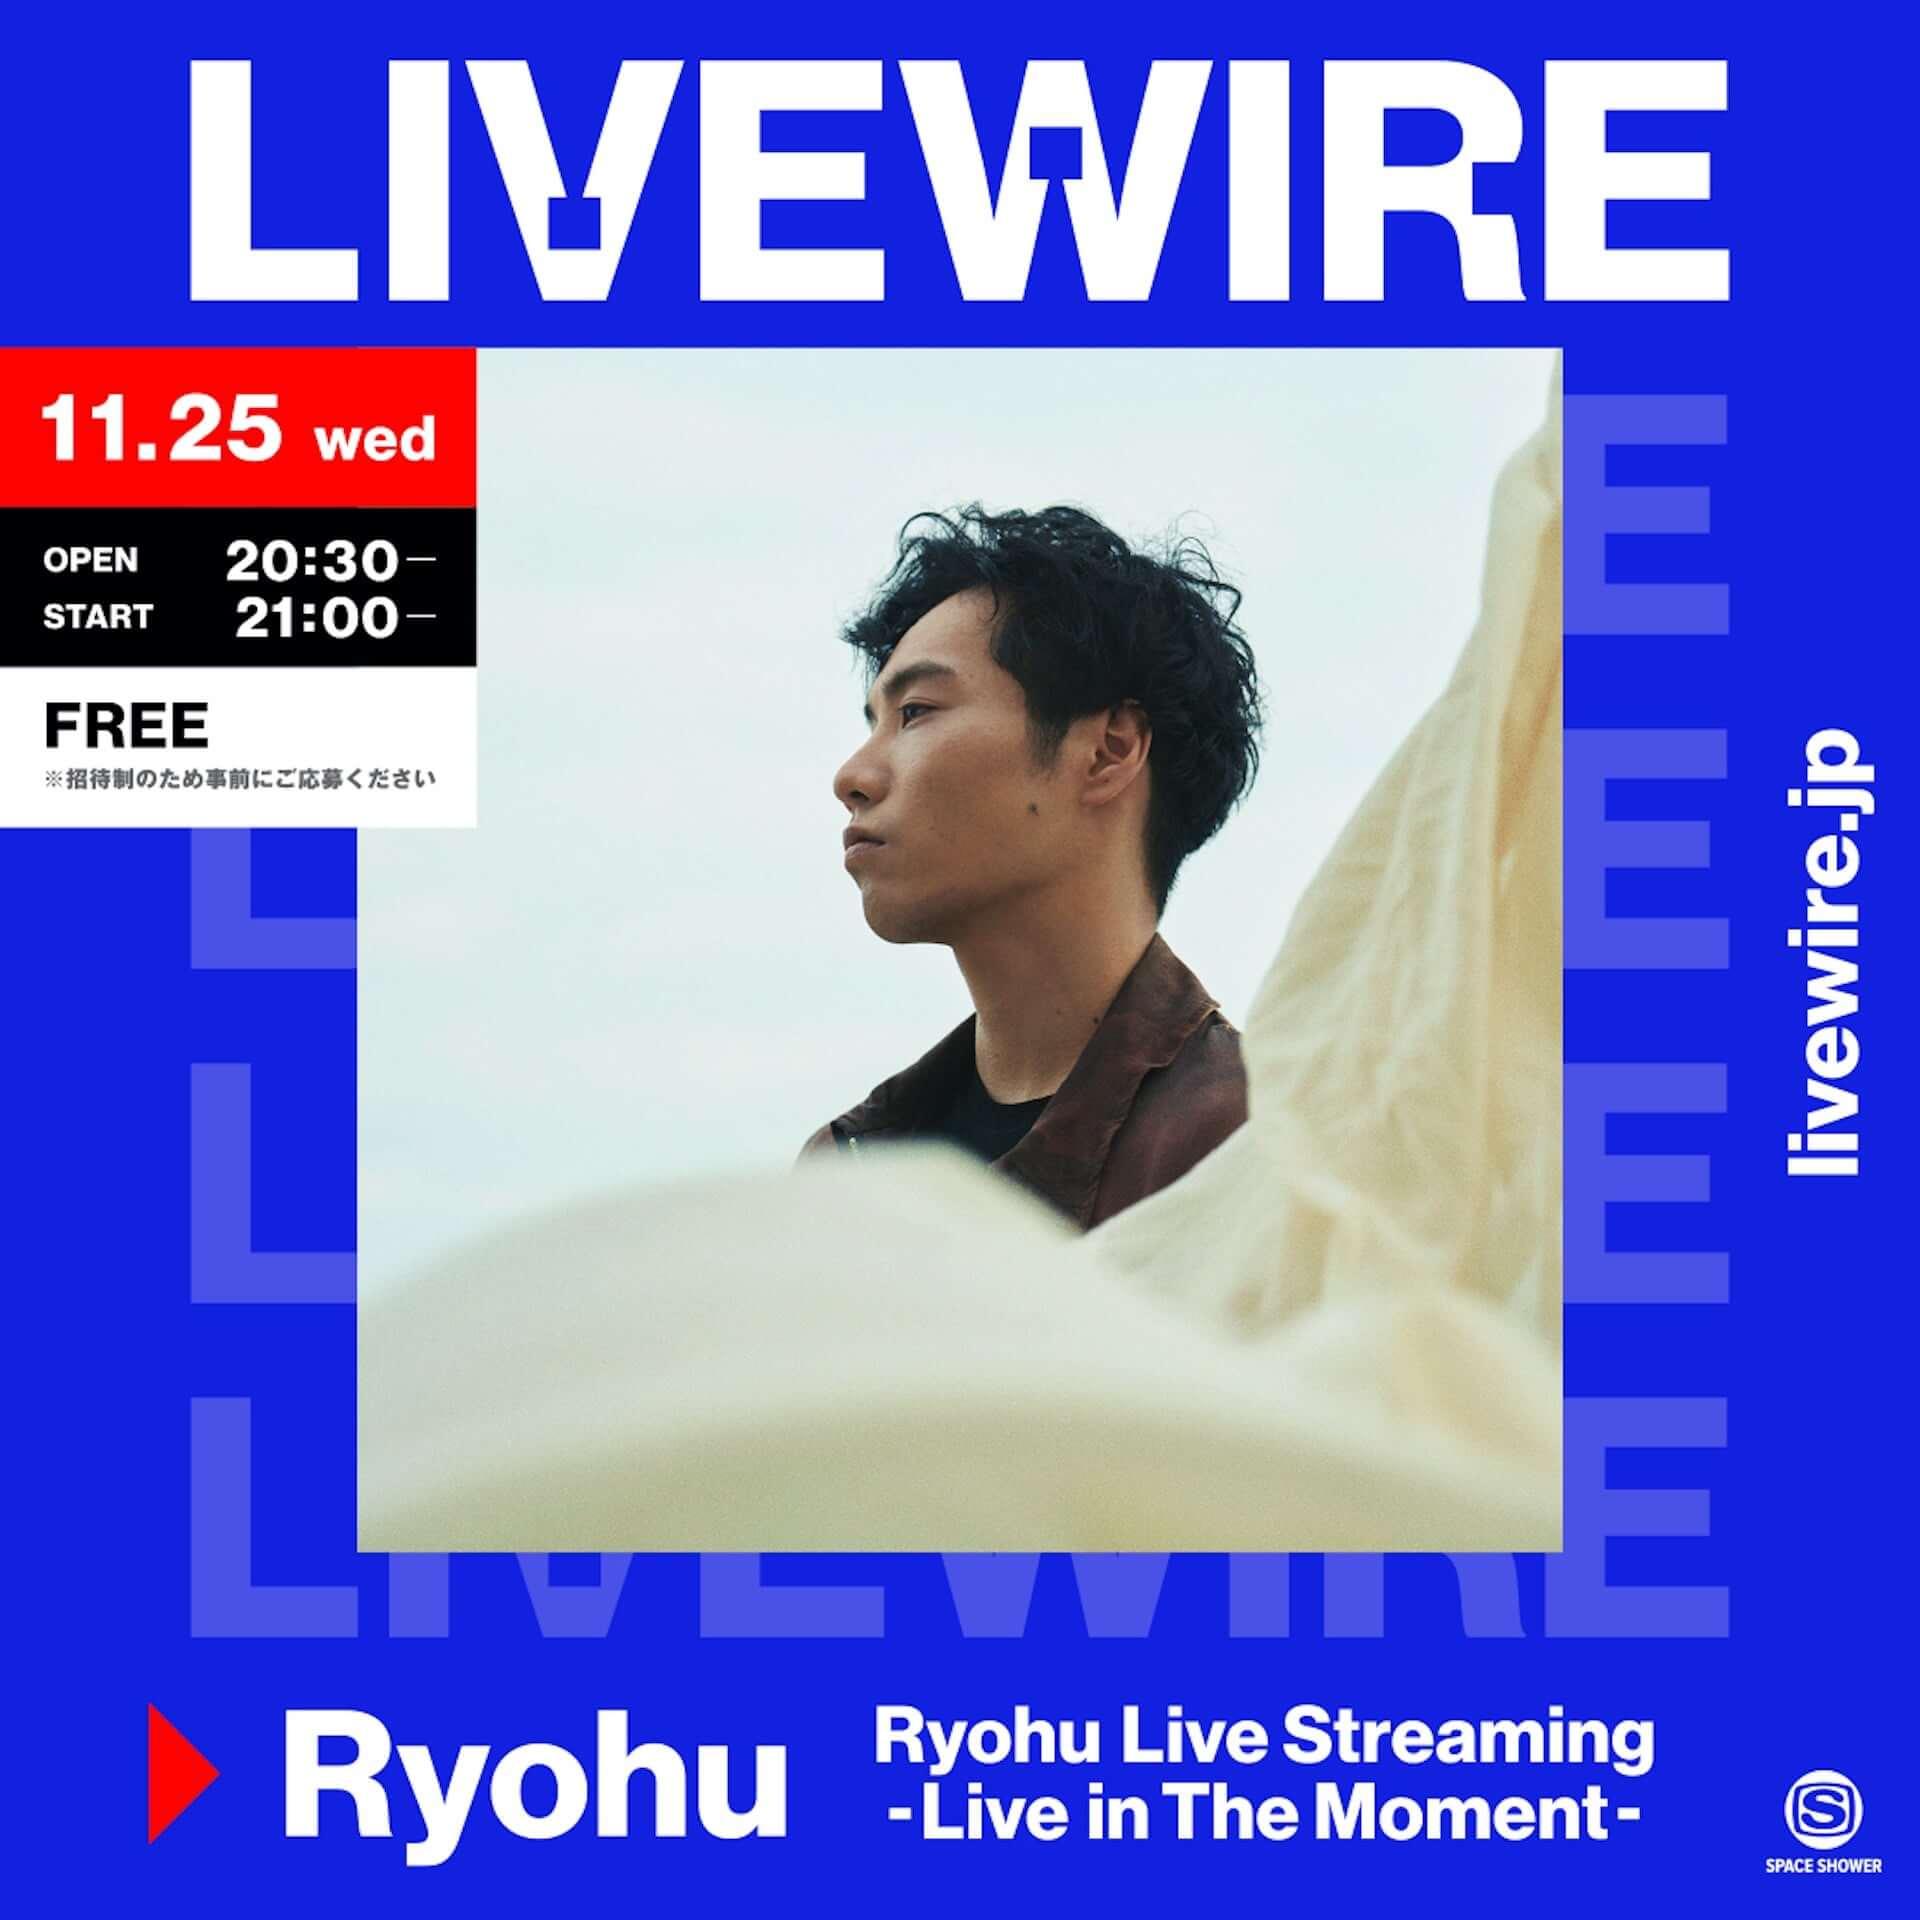 Ryohuの1stアルバム『DEBUT』リリース記念ライブにAAAMYYY、TENDRE、Shin Sakiuraが出演決定!フリーチケットは申し込み受付中 music201120_ryohu_4-1920x1920